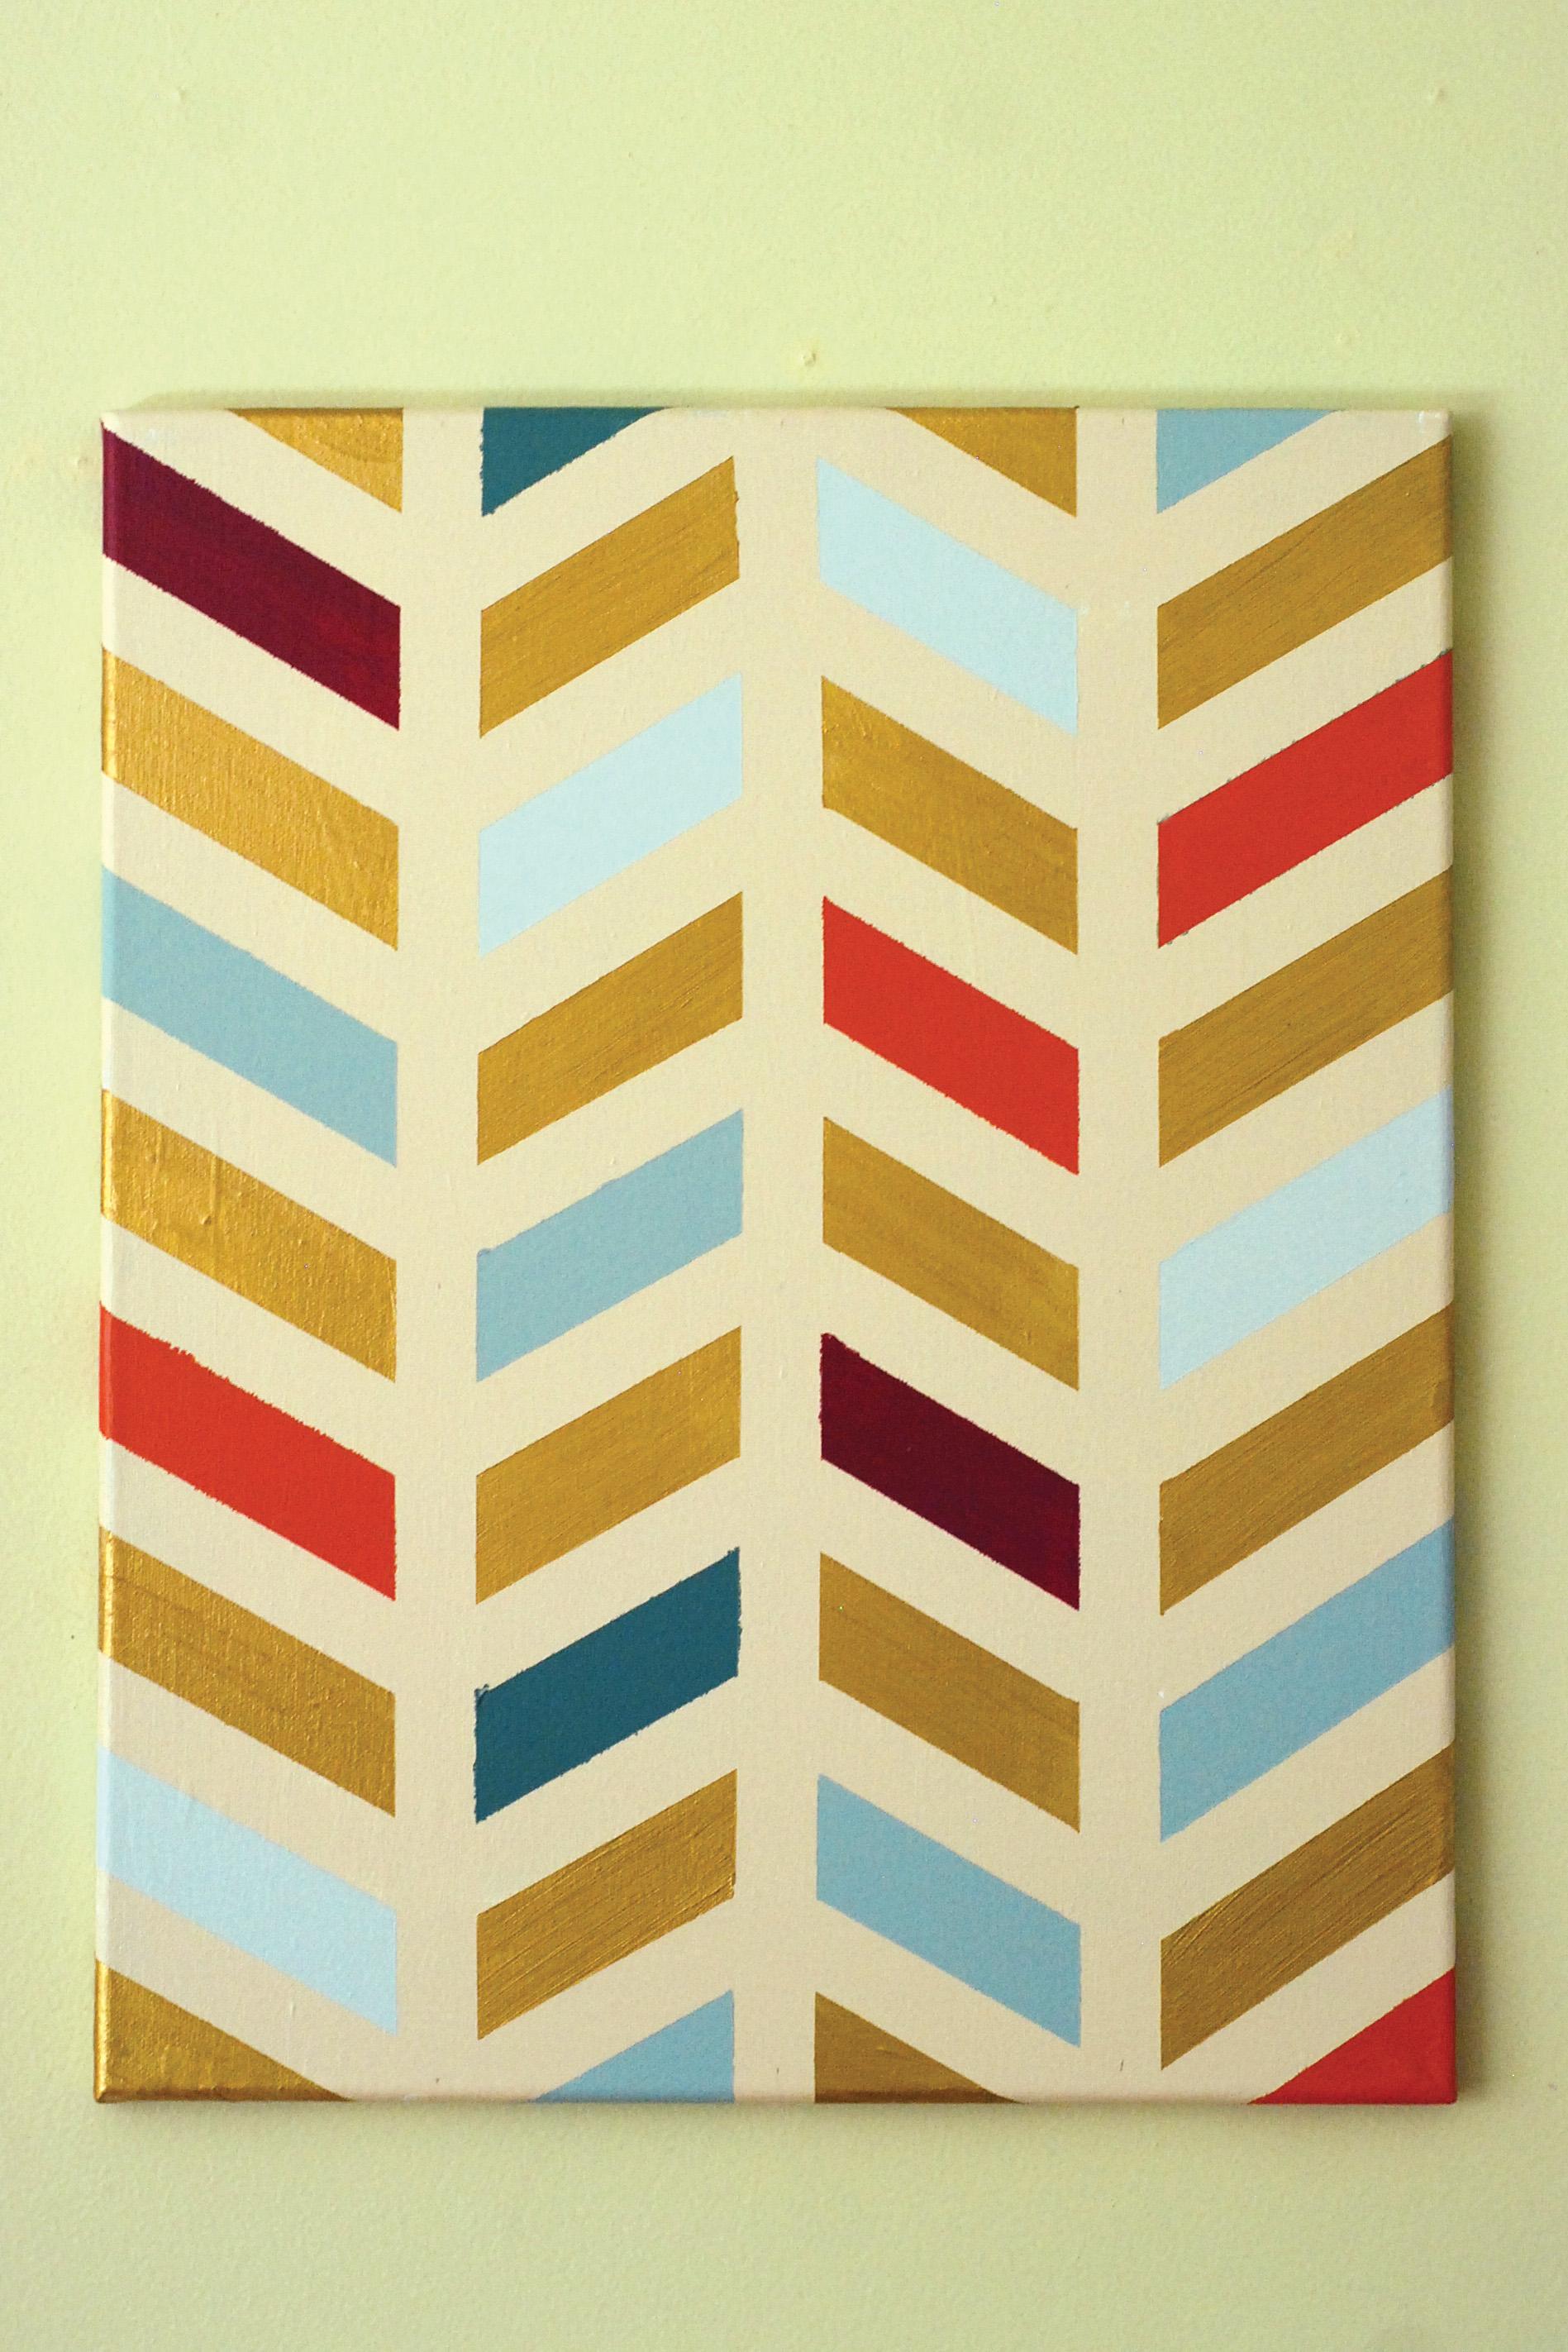 Easy DIY Chevron Painted Canvas – One Cherry Tree Lane